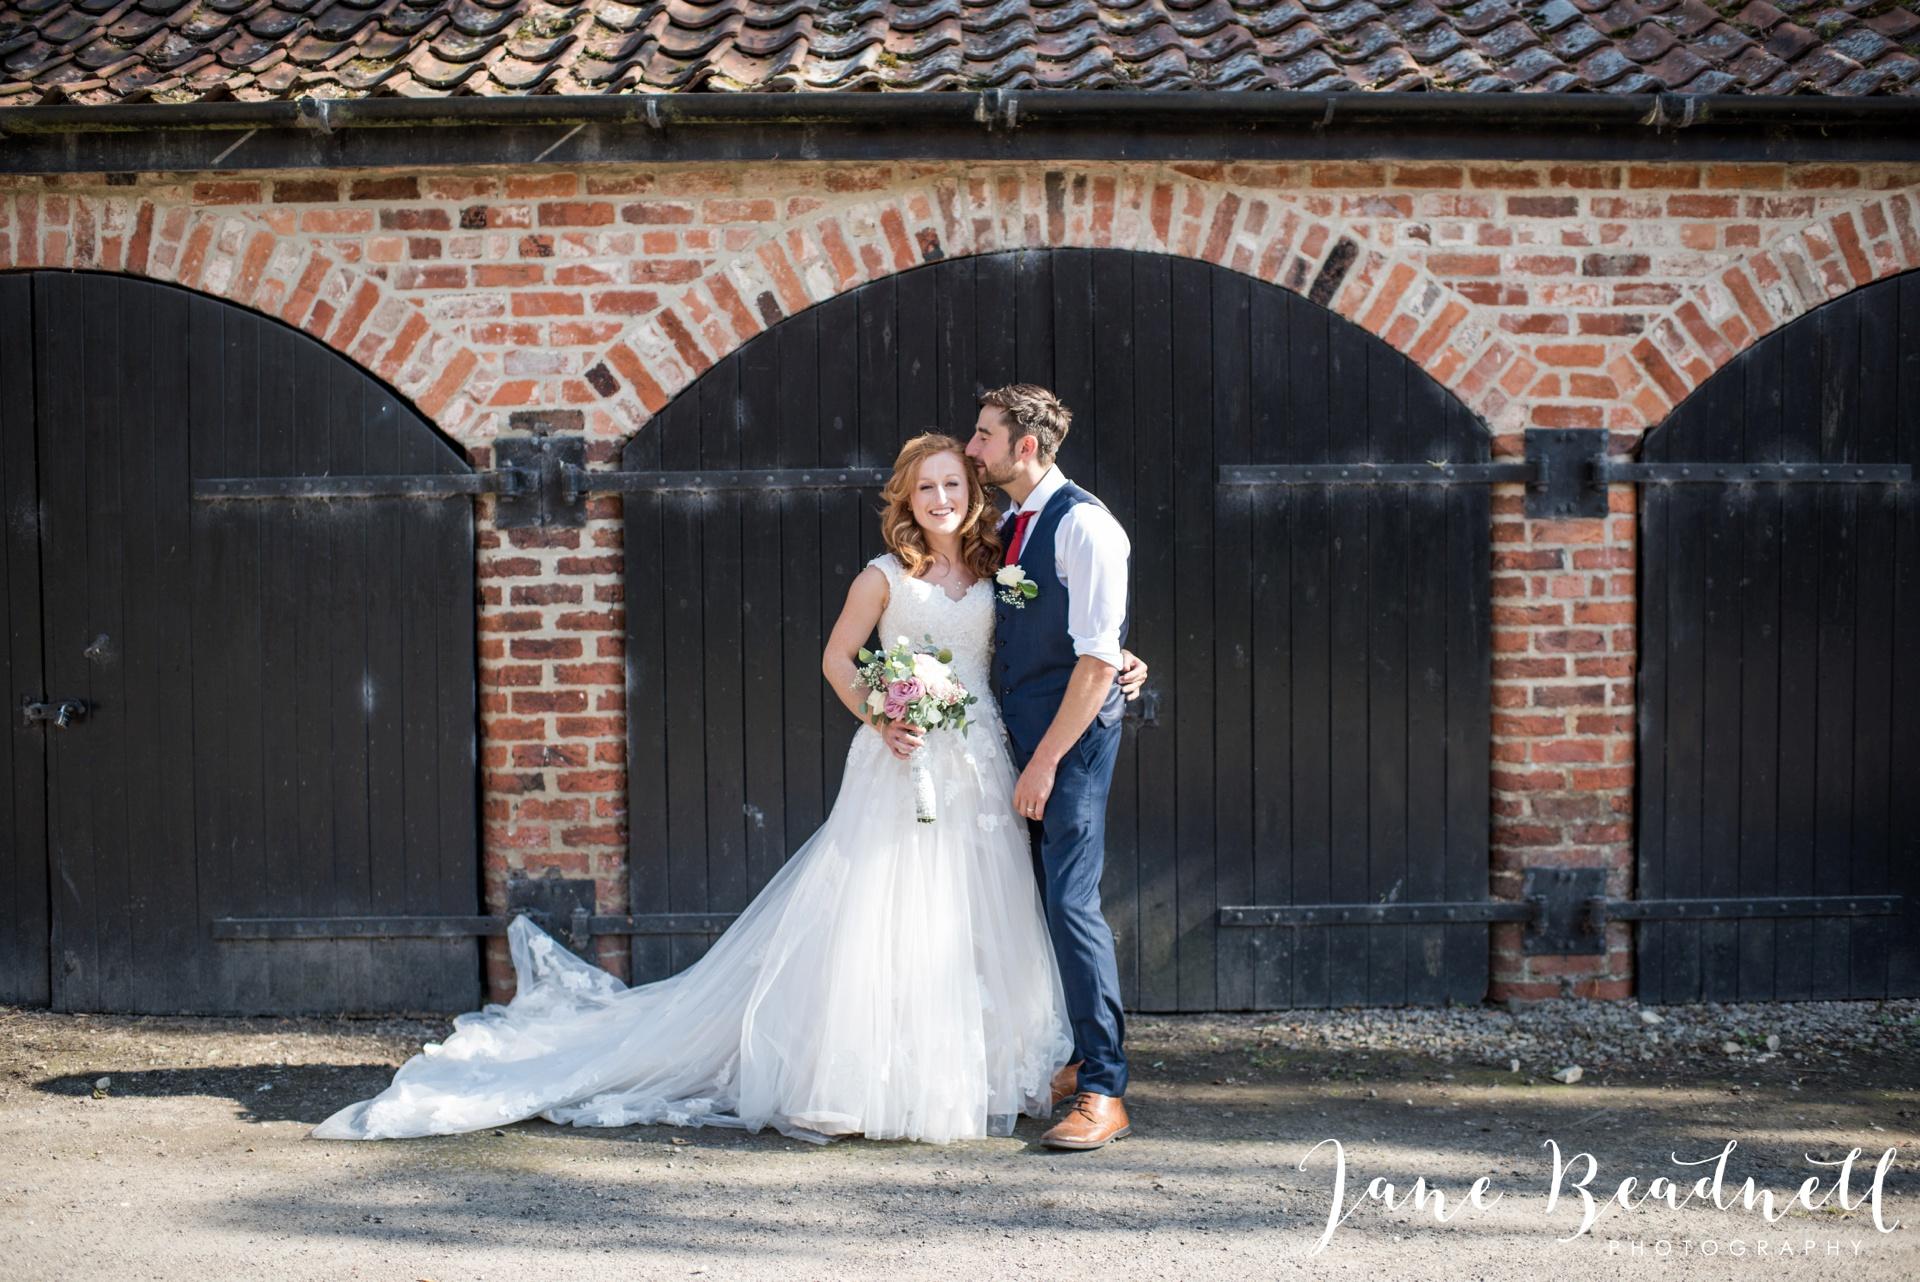 yorkshire-fine-art-wedding-photographer-jane-beadnell-photography-poppleton-york_0105